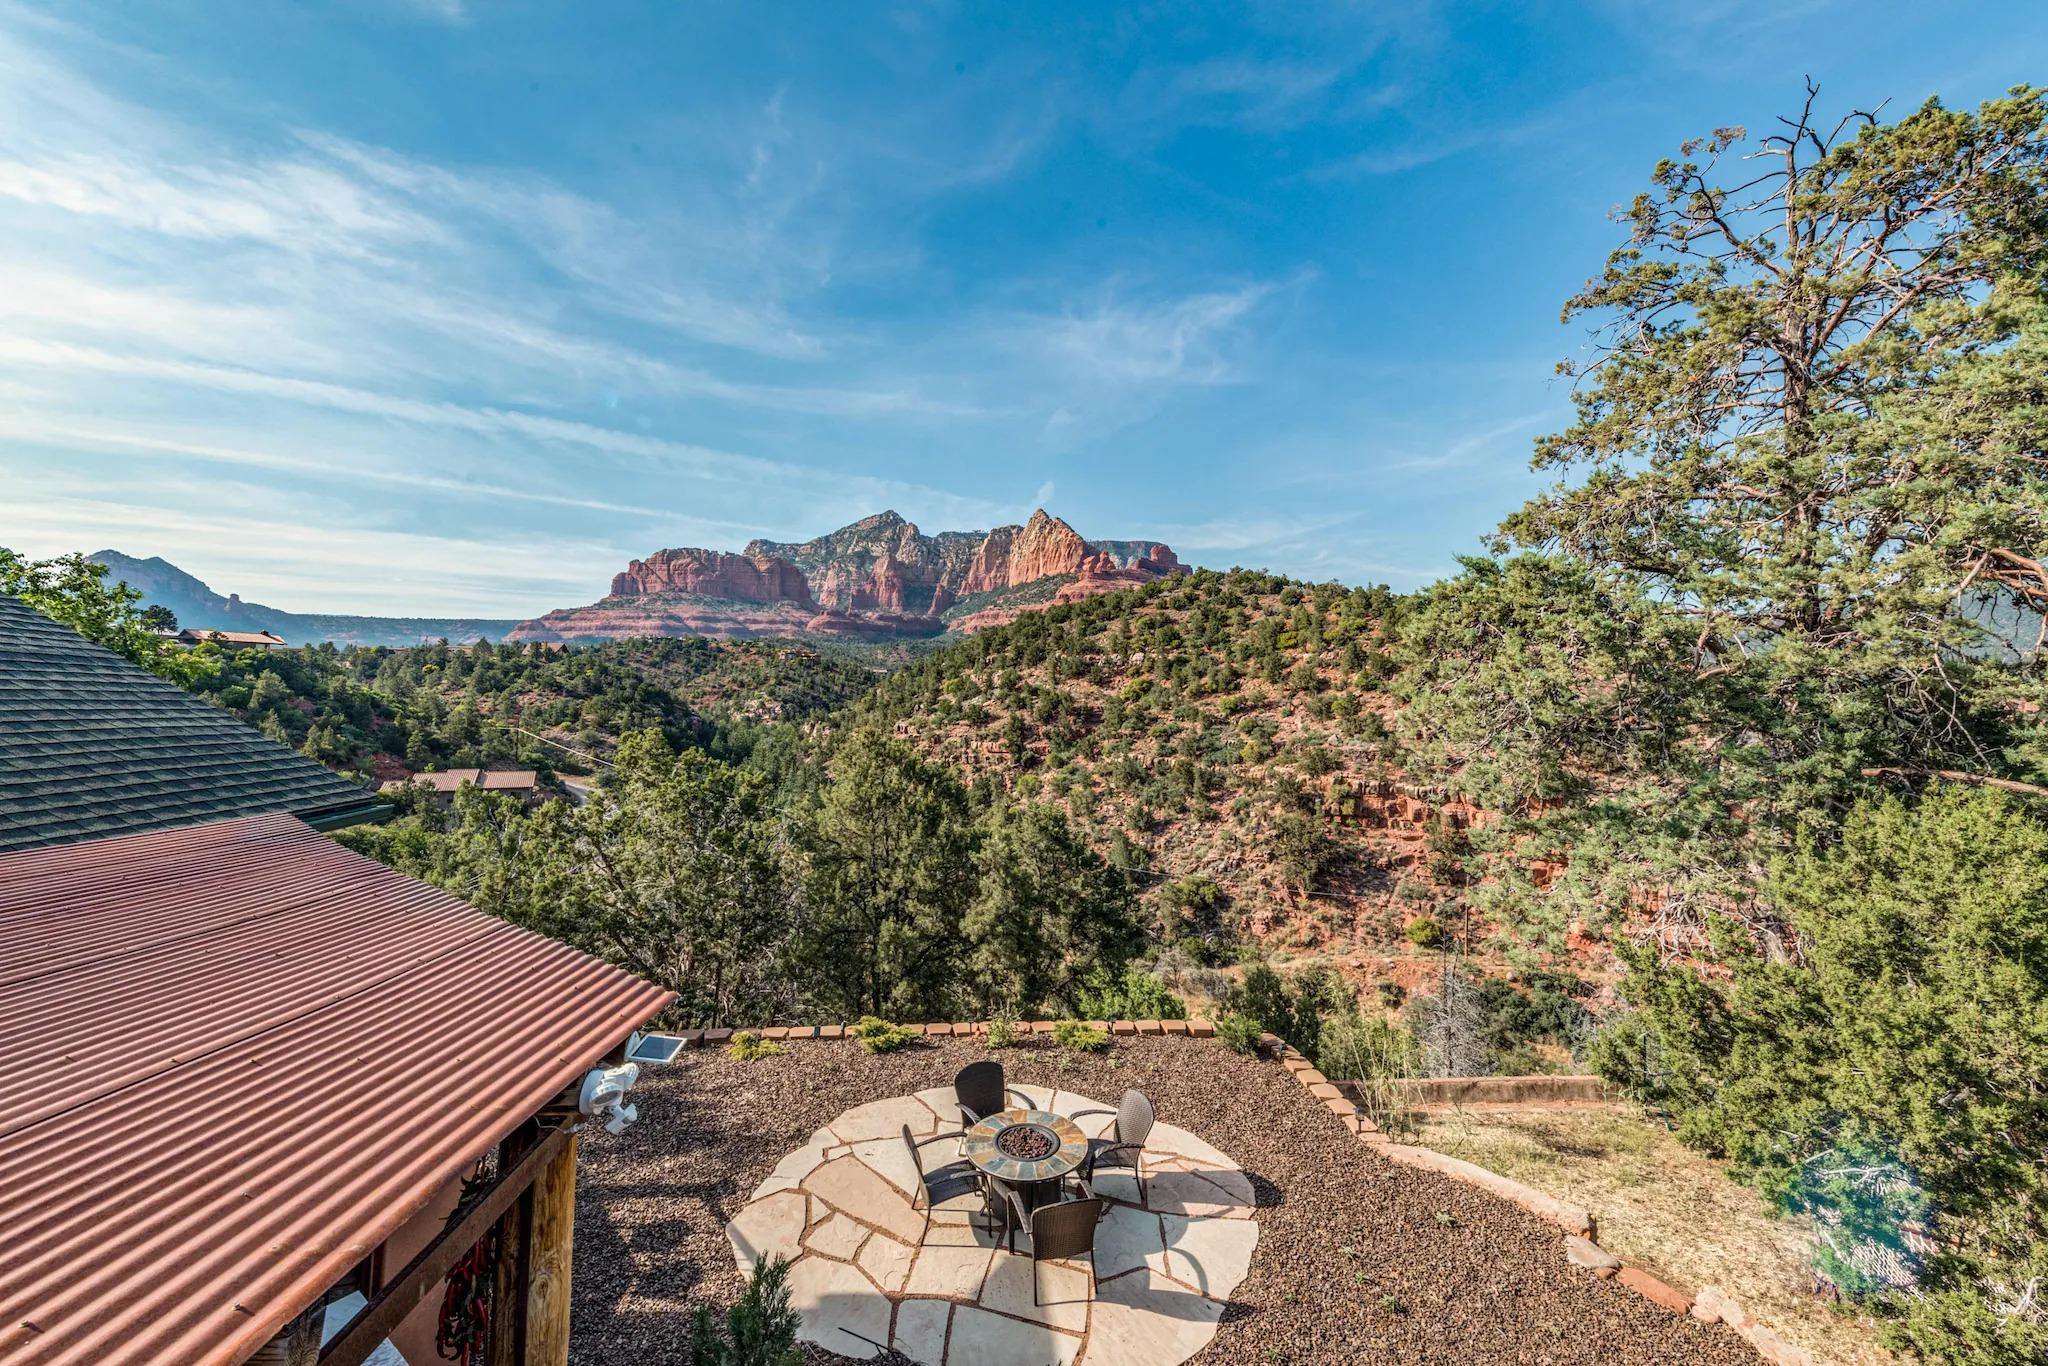 Spectacular View in Sedona, Arizona